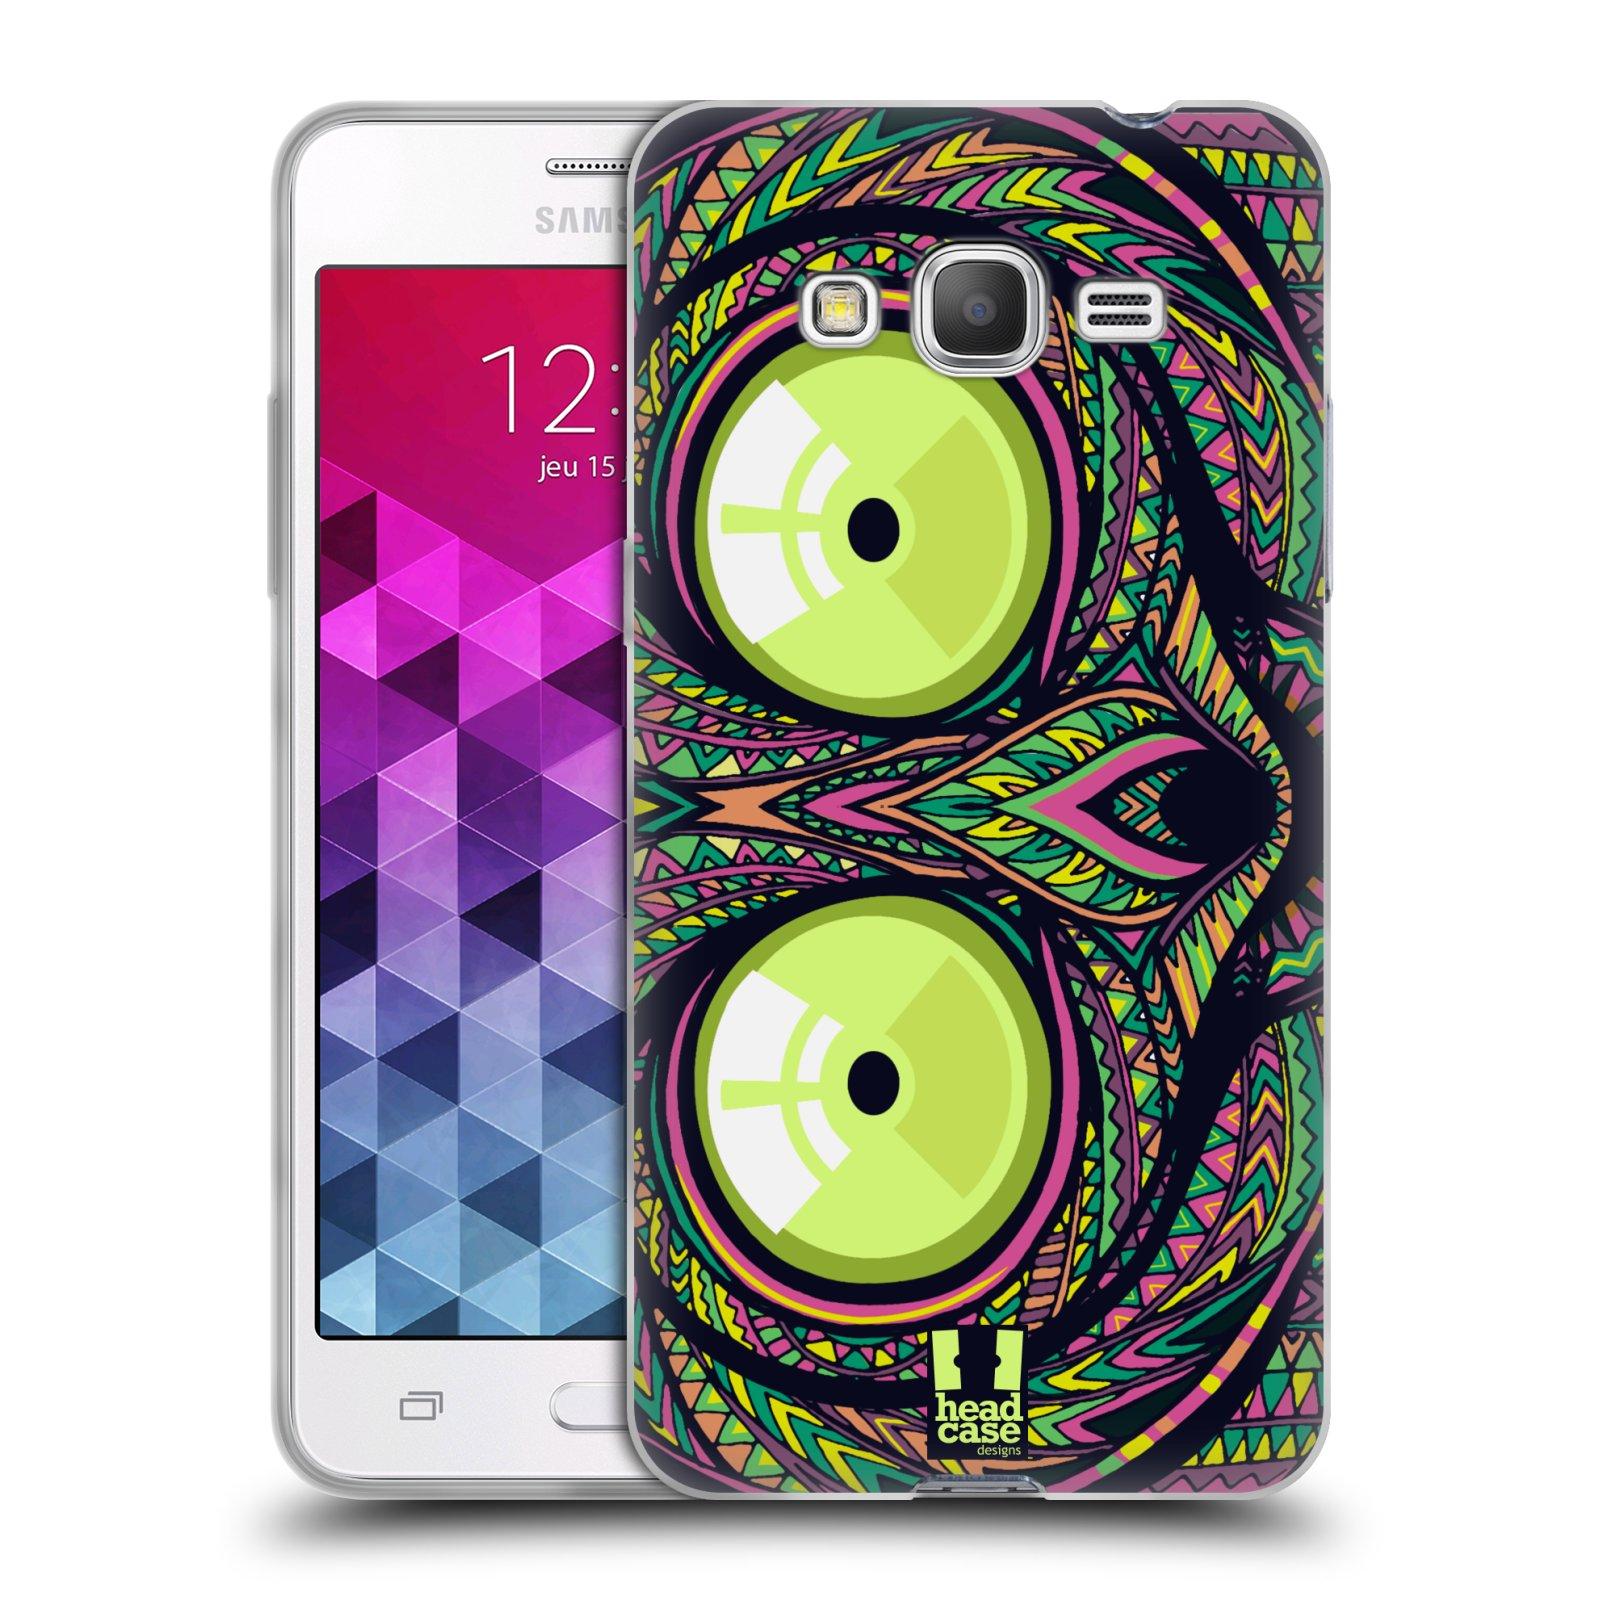 Silikonové pouzdro na mobil Samsung Galaxy Grand Prime VE HEAD CASE AZTEC NÁRTOUN